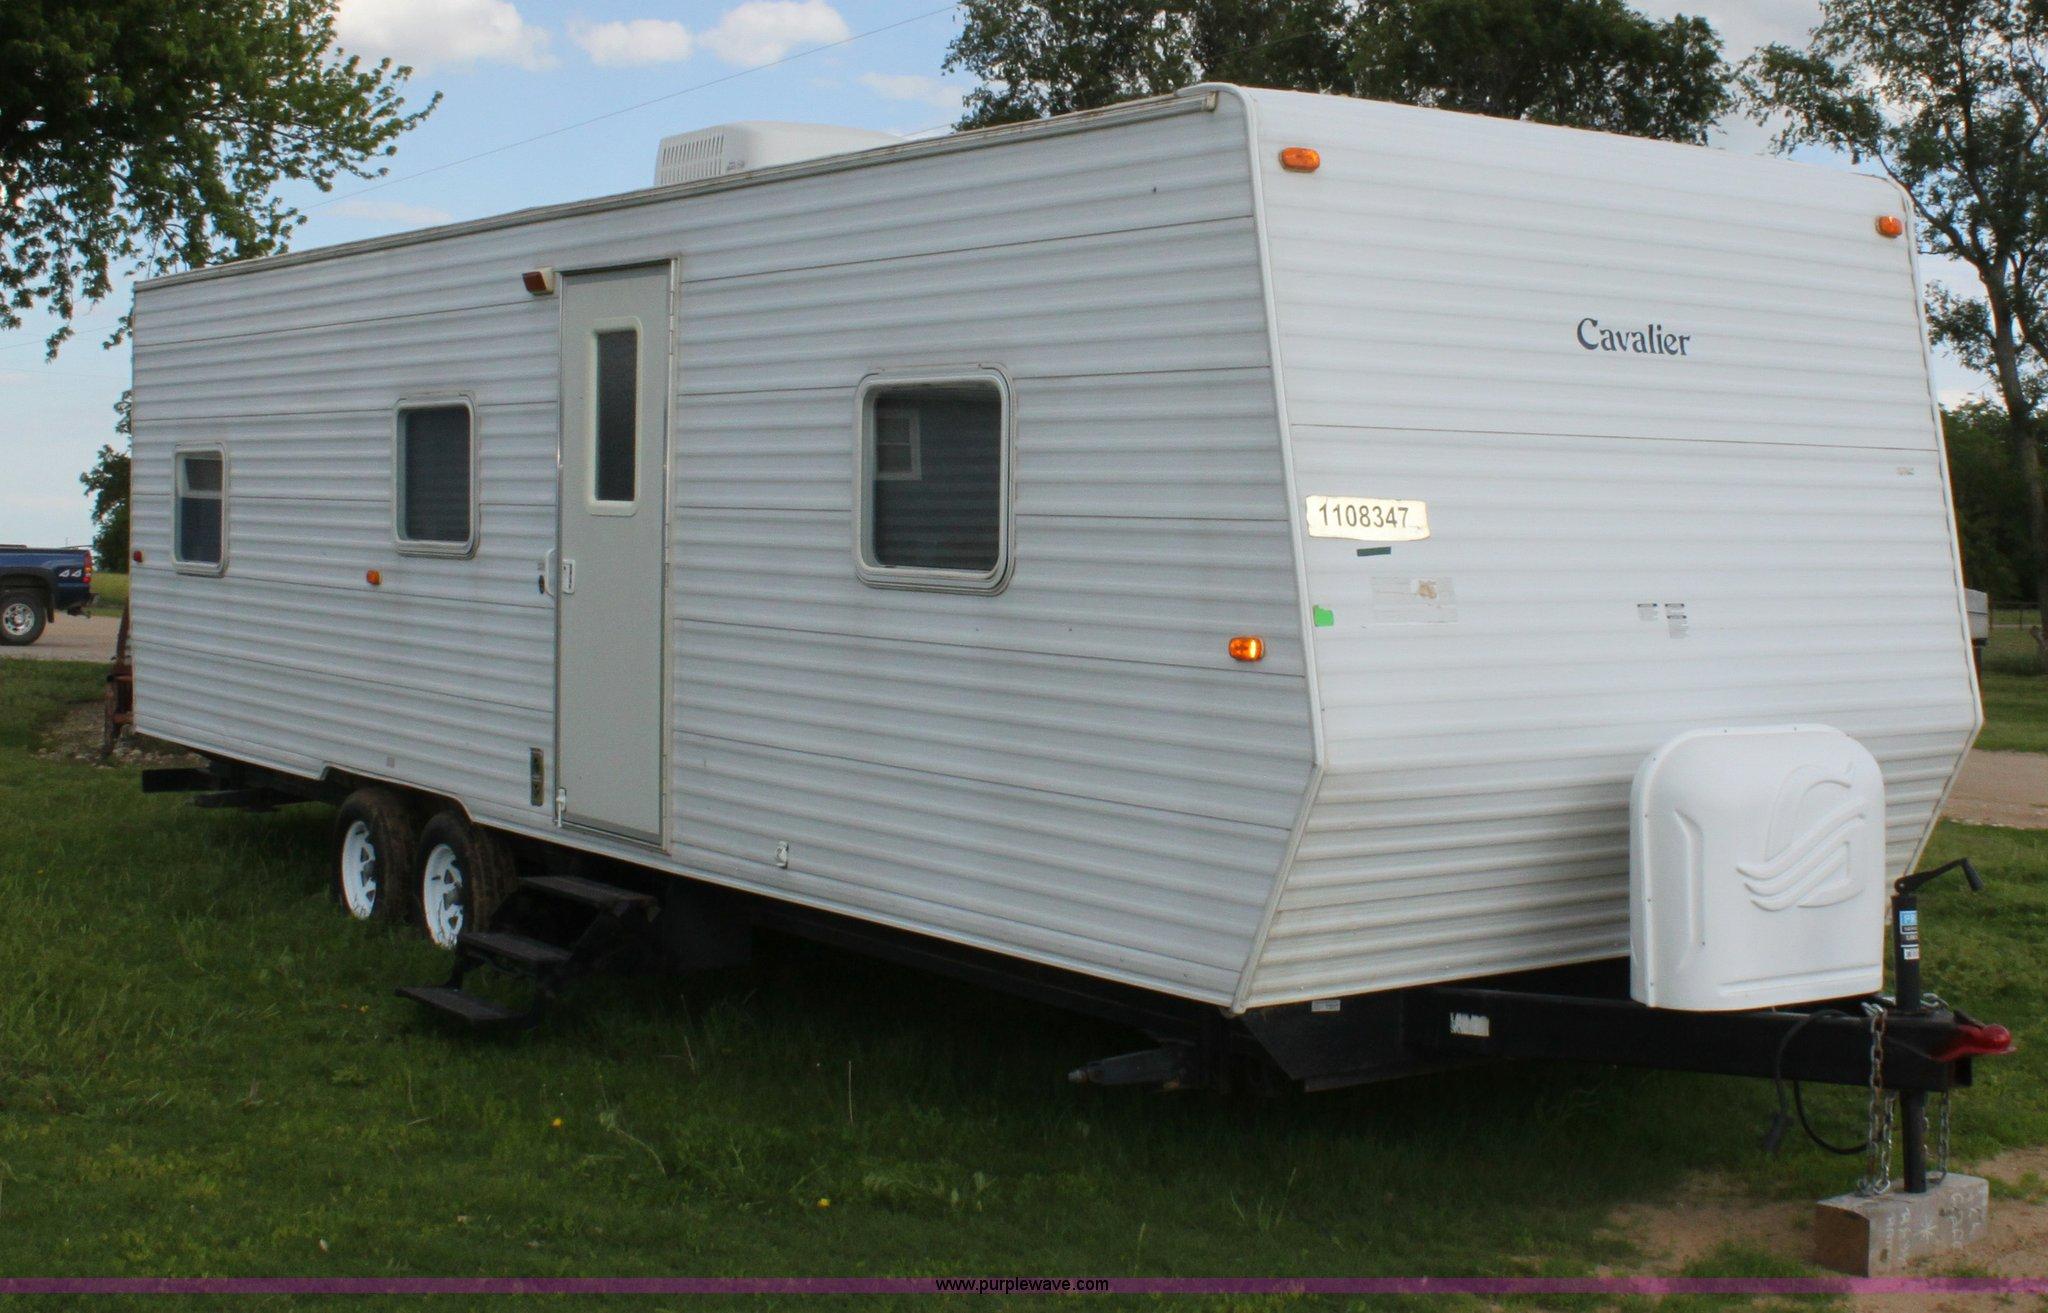 2005 gulfstream cavalier camper item d7997 sold may 30 rh purplewave com gulfstream cavalier travel trailer owners manual 2006 cavalier travel trailer owners manual